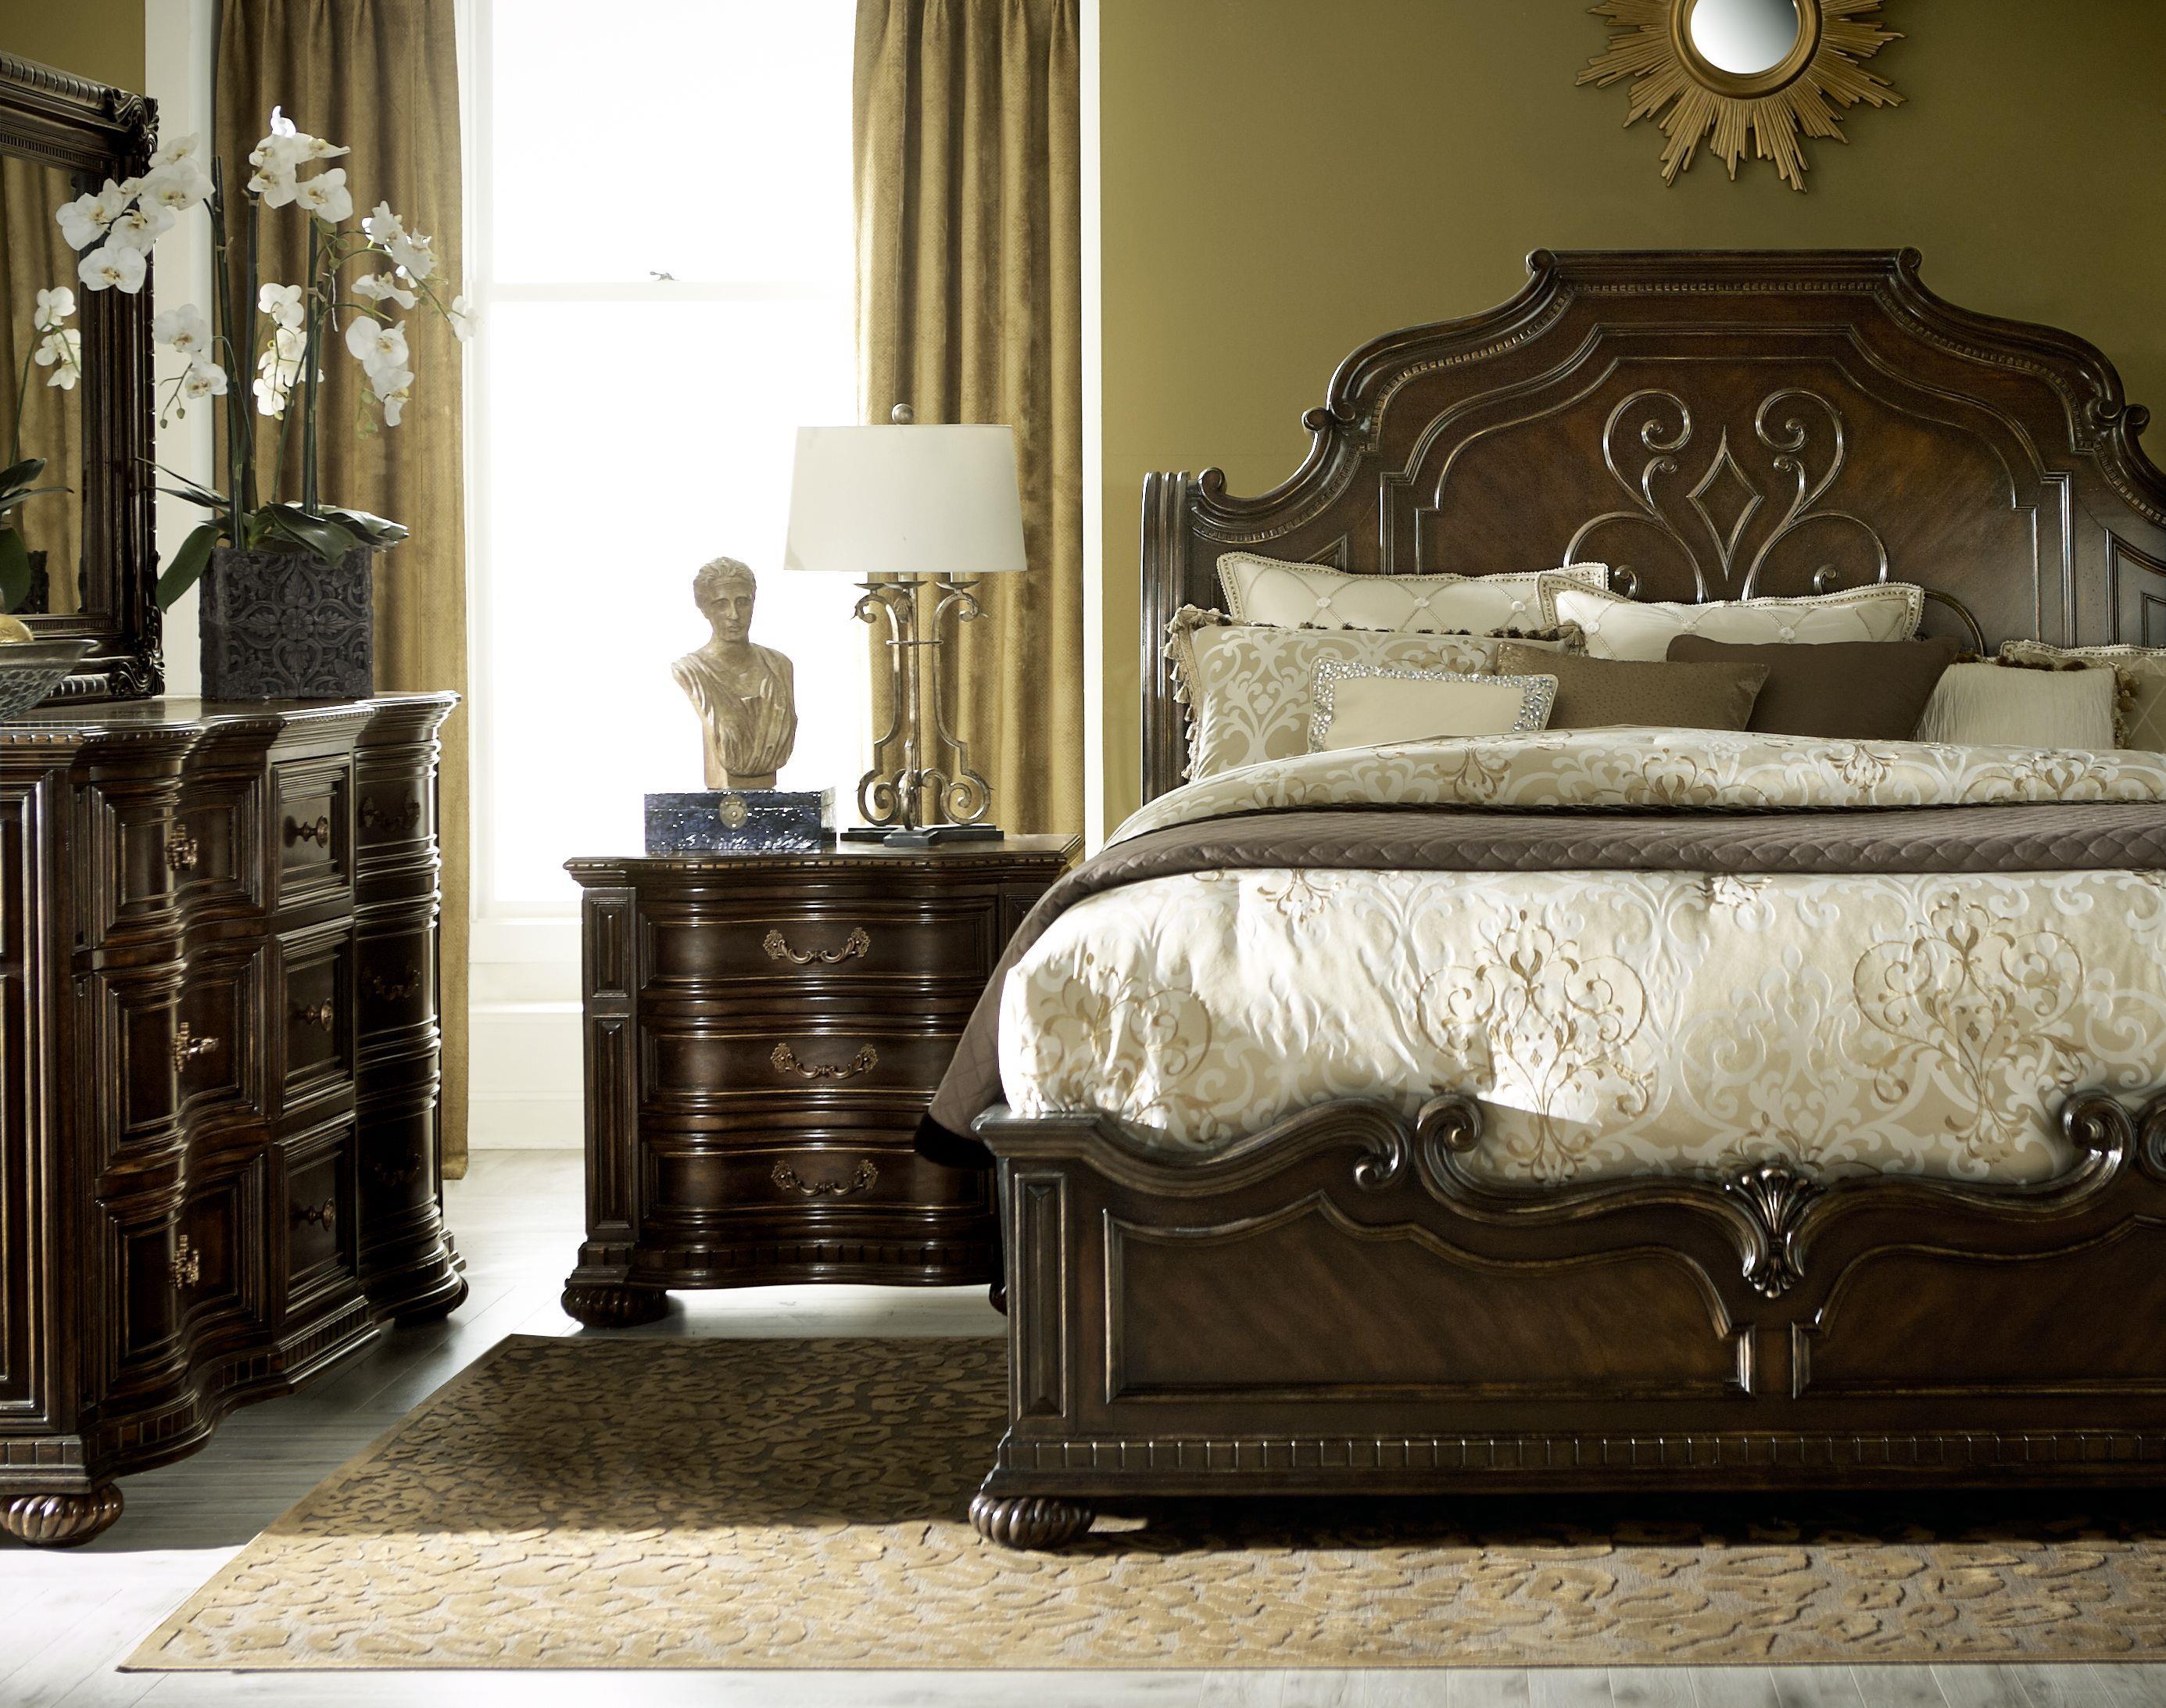 Legacy Classic La Bella Vita King Bedroom Group - Item Number: 4200 K Bedroom Group 1